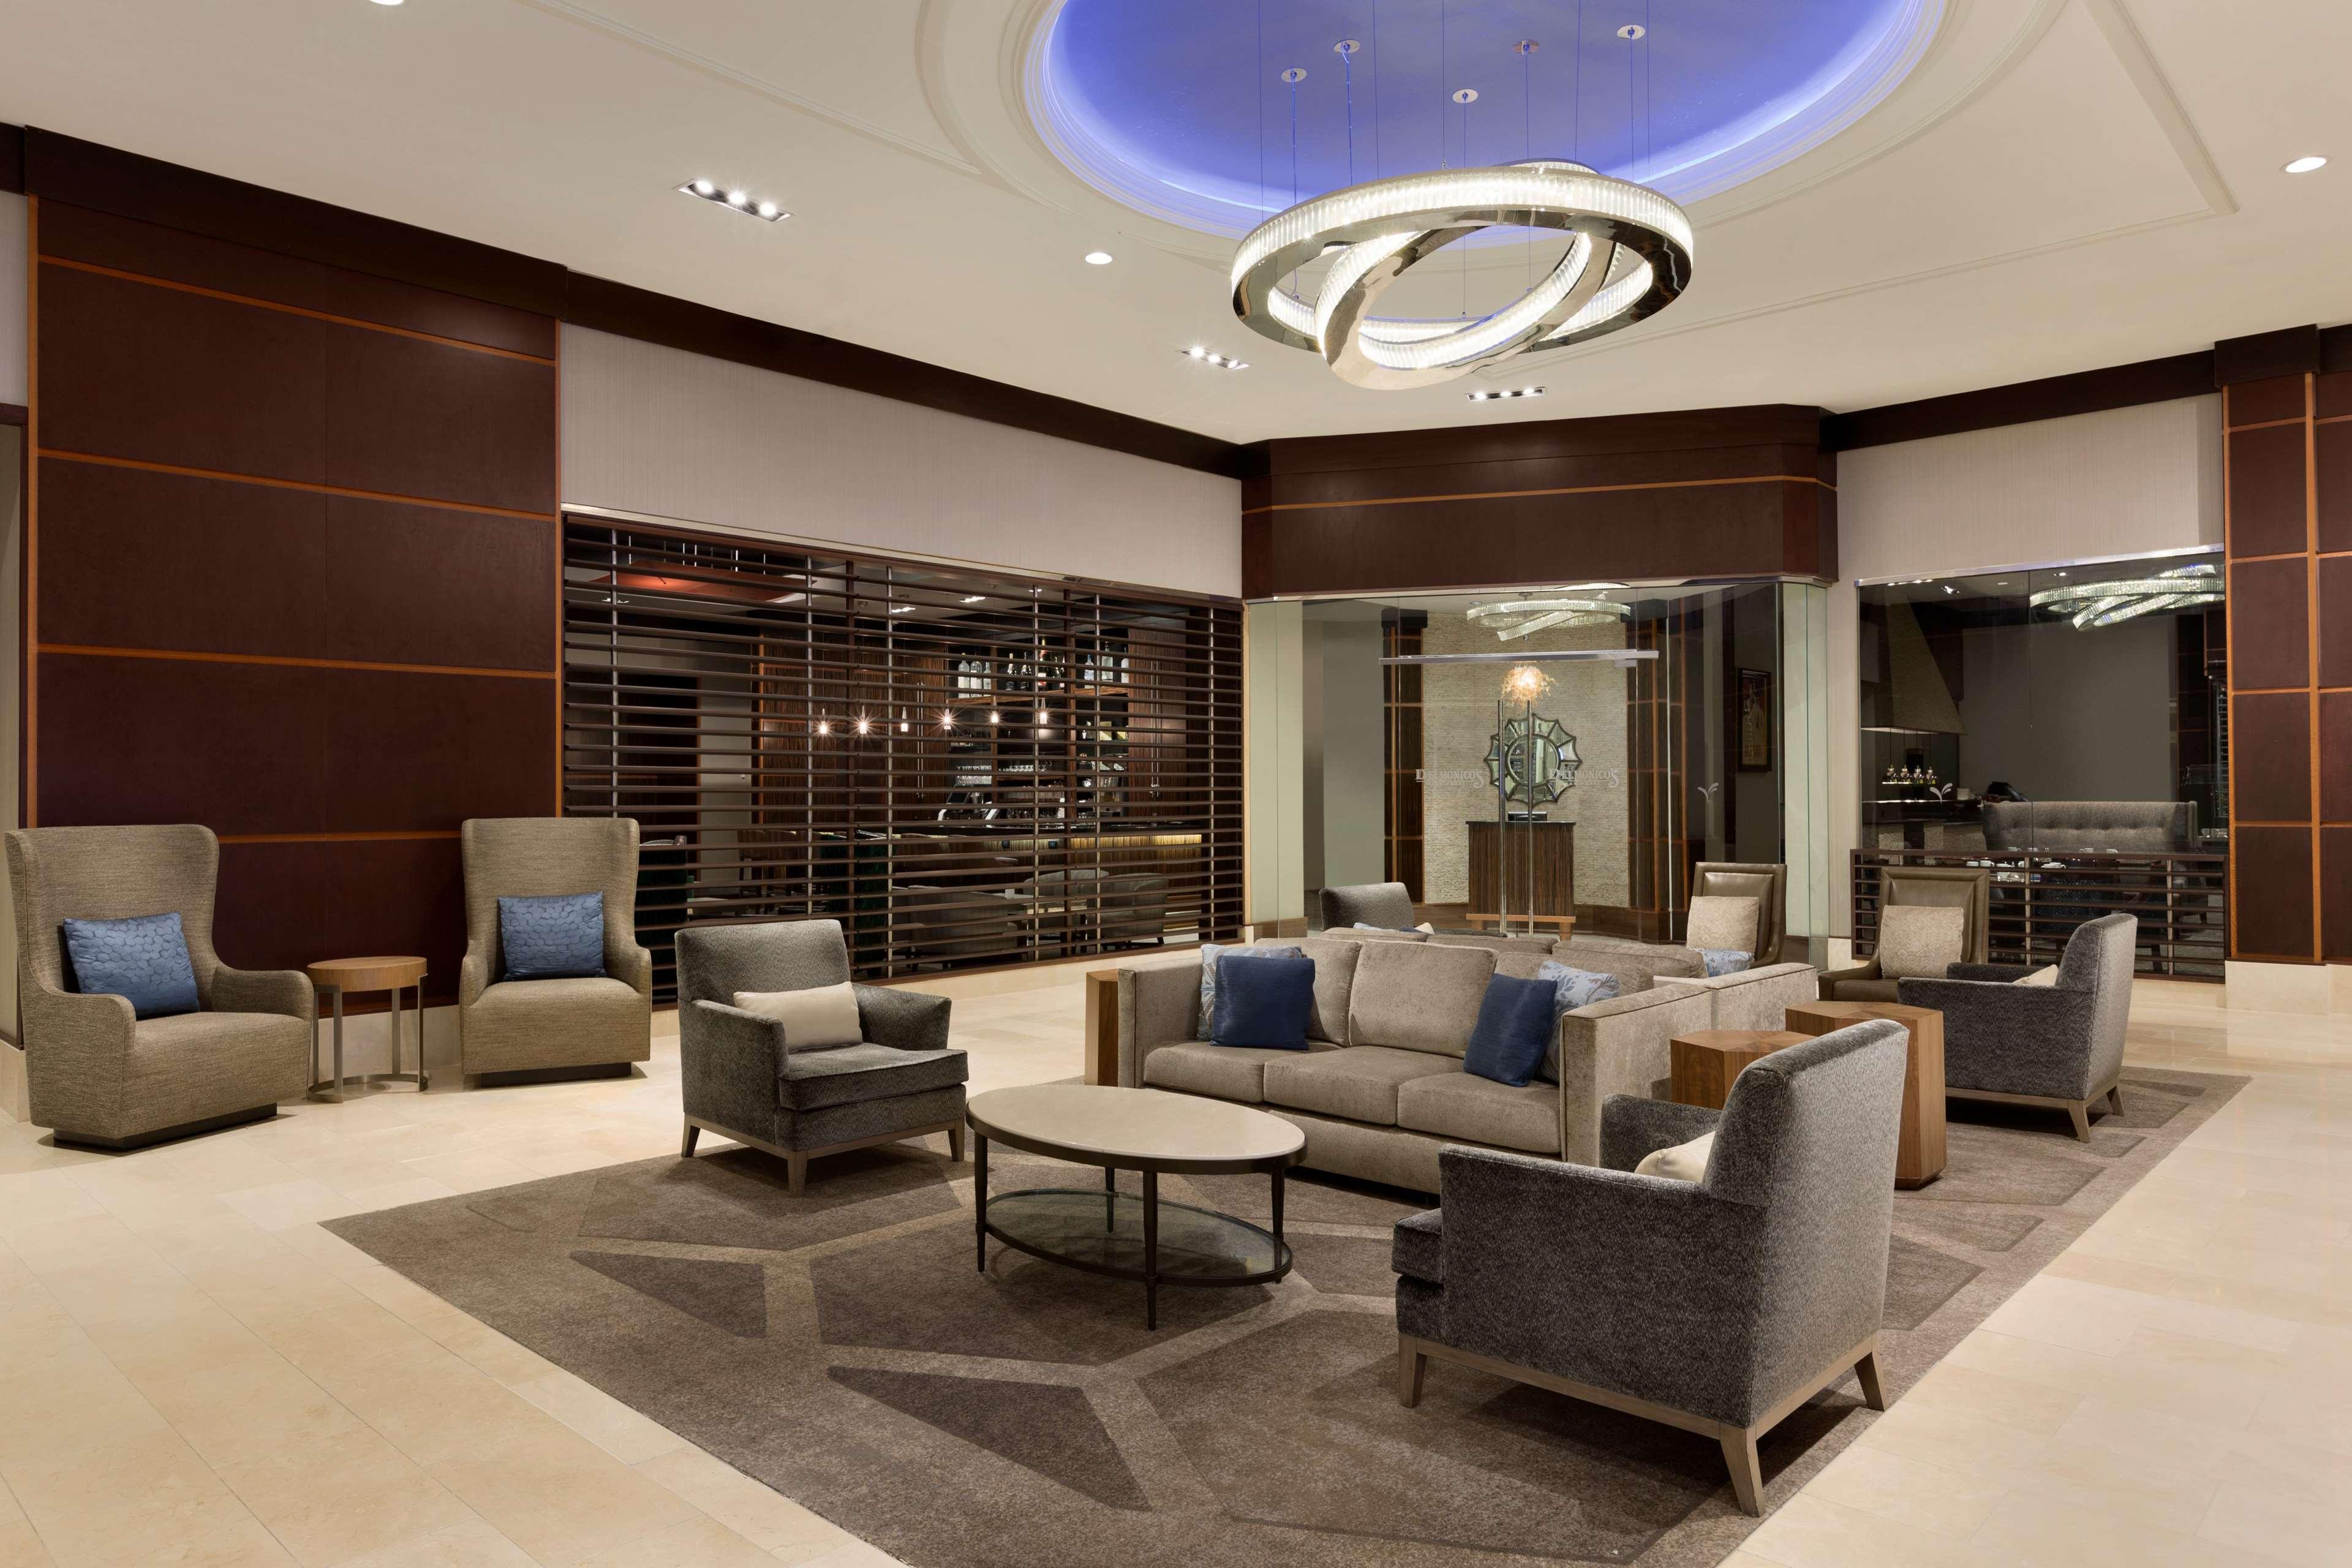 Hilton Philadelphia City Avenue image 3